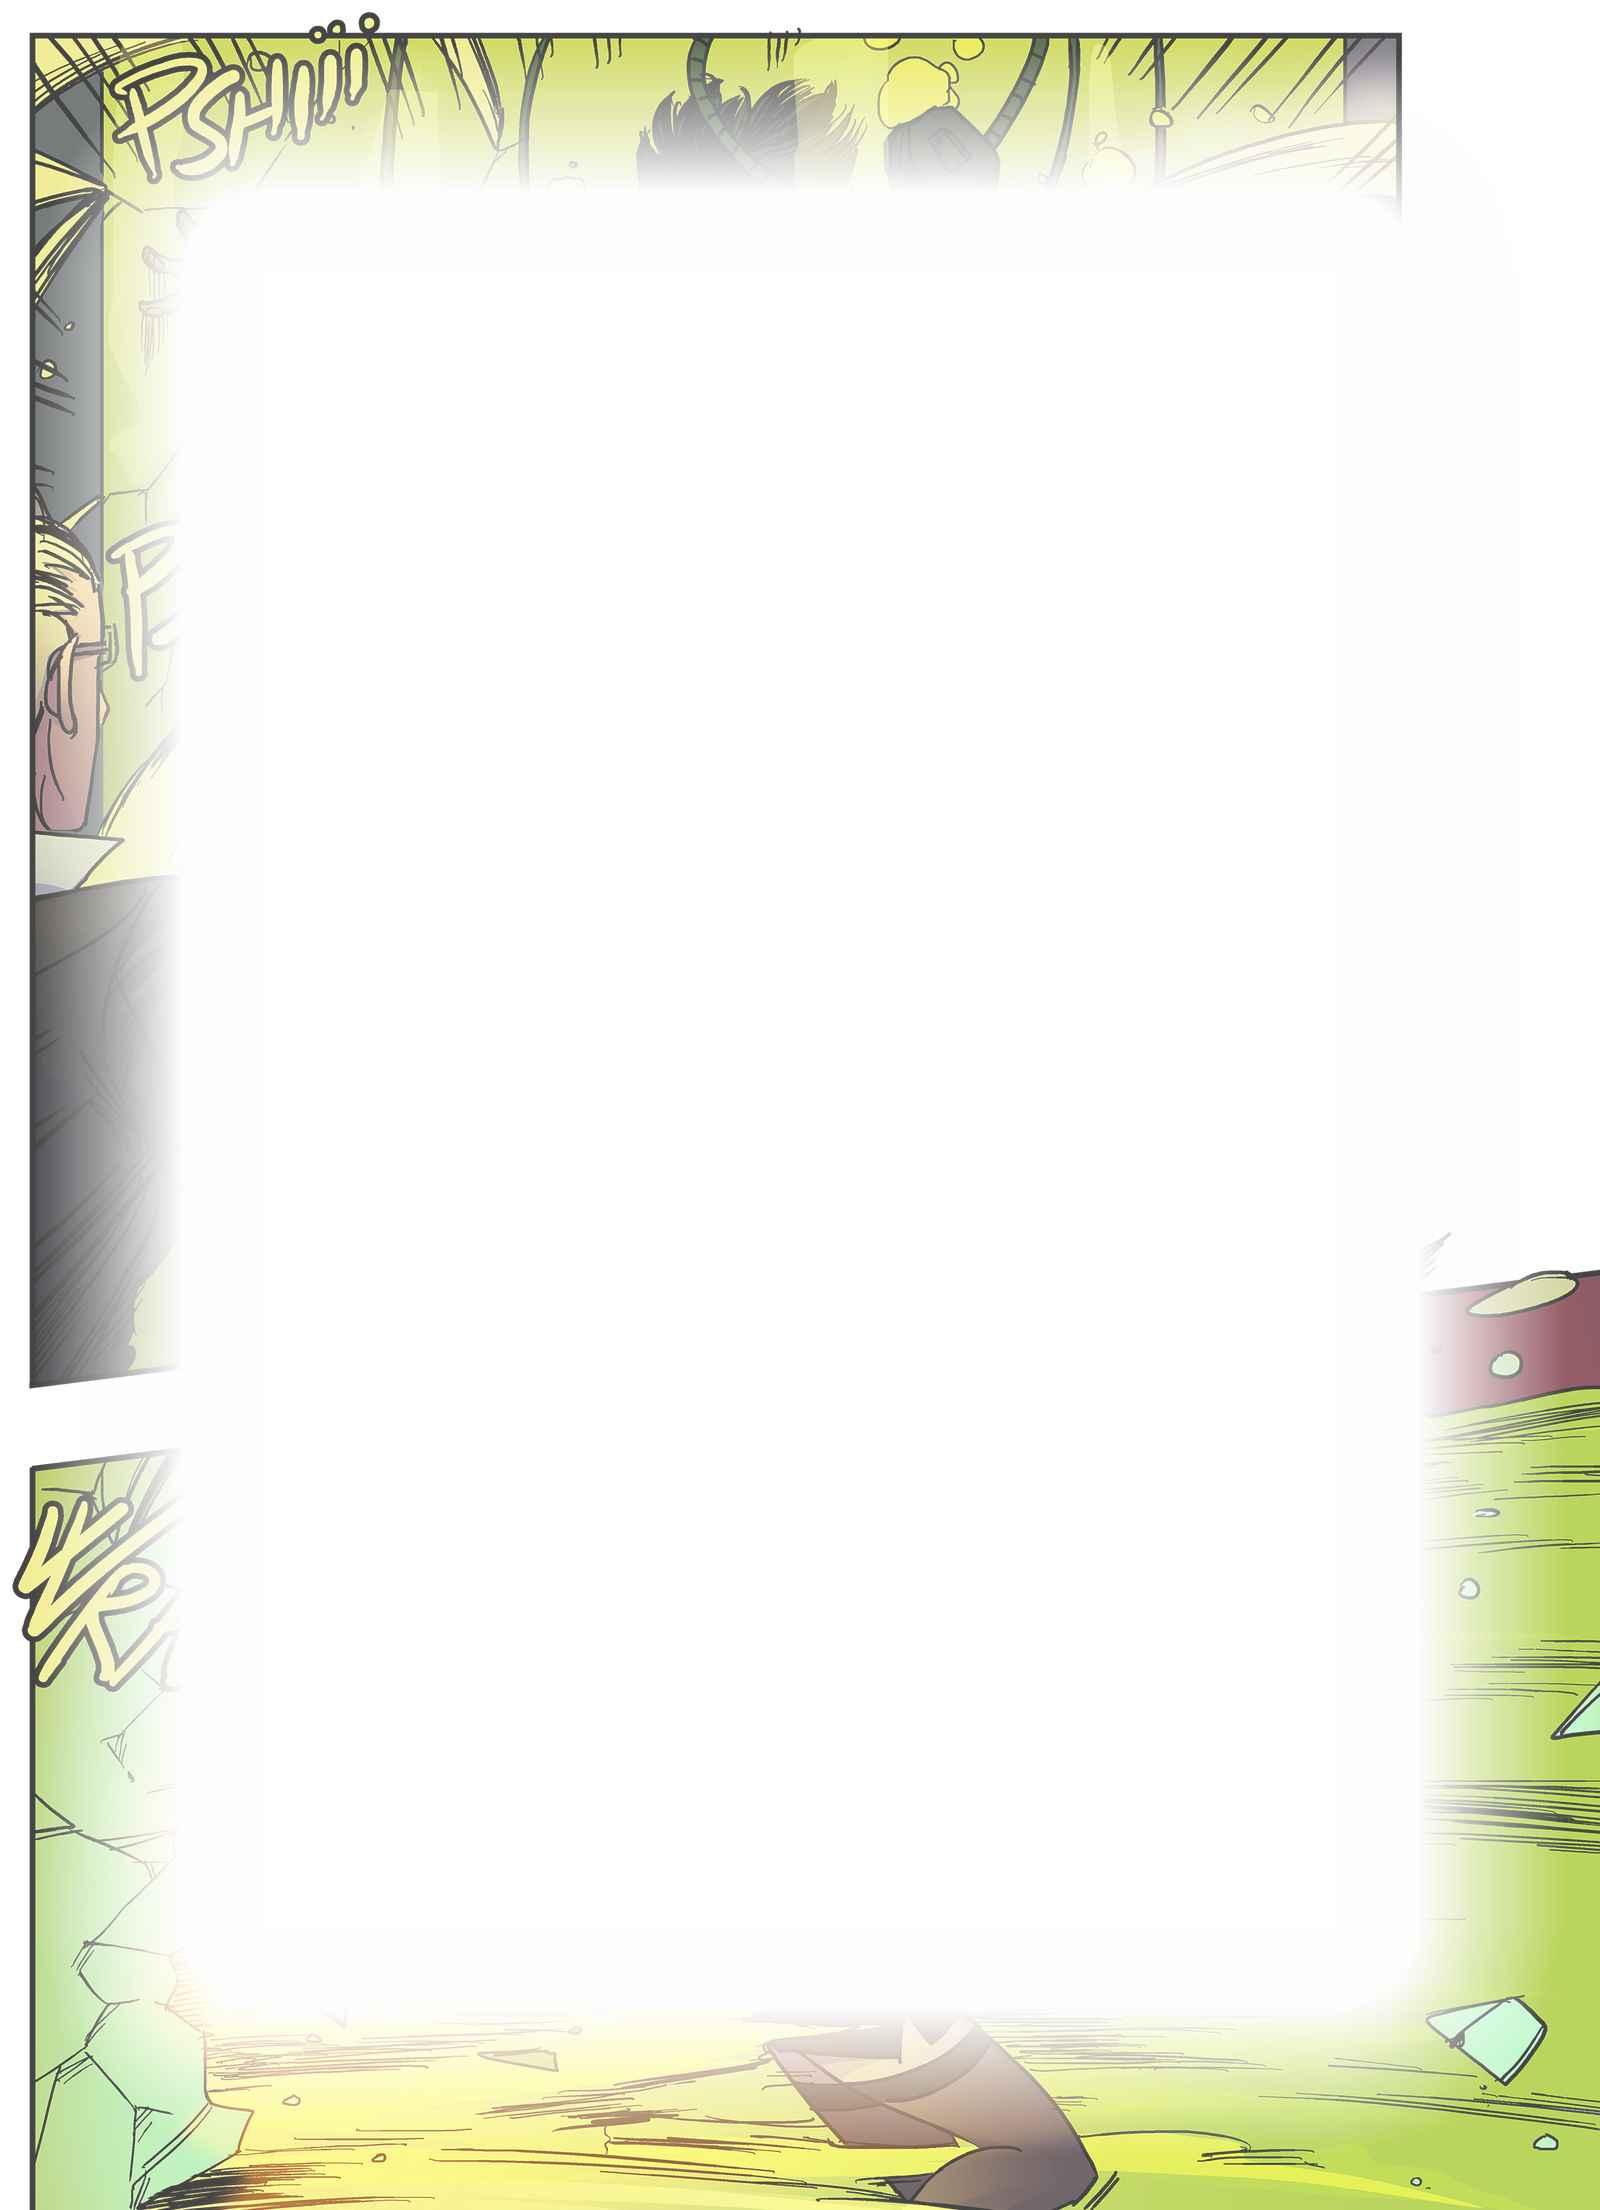 Amilova : Chapitre 8 page 5